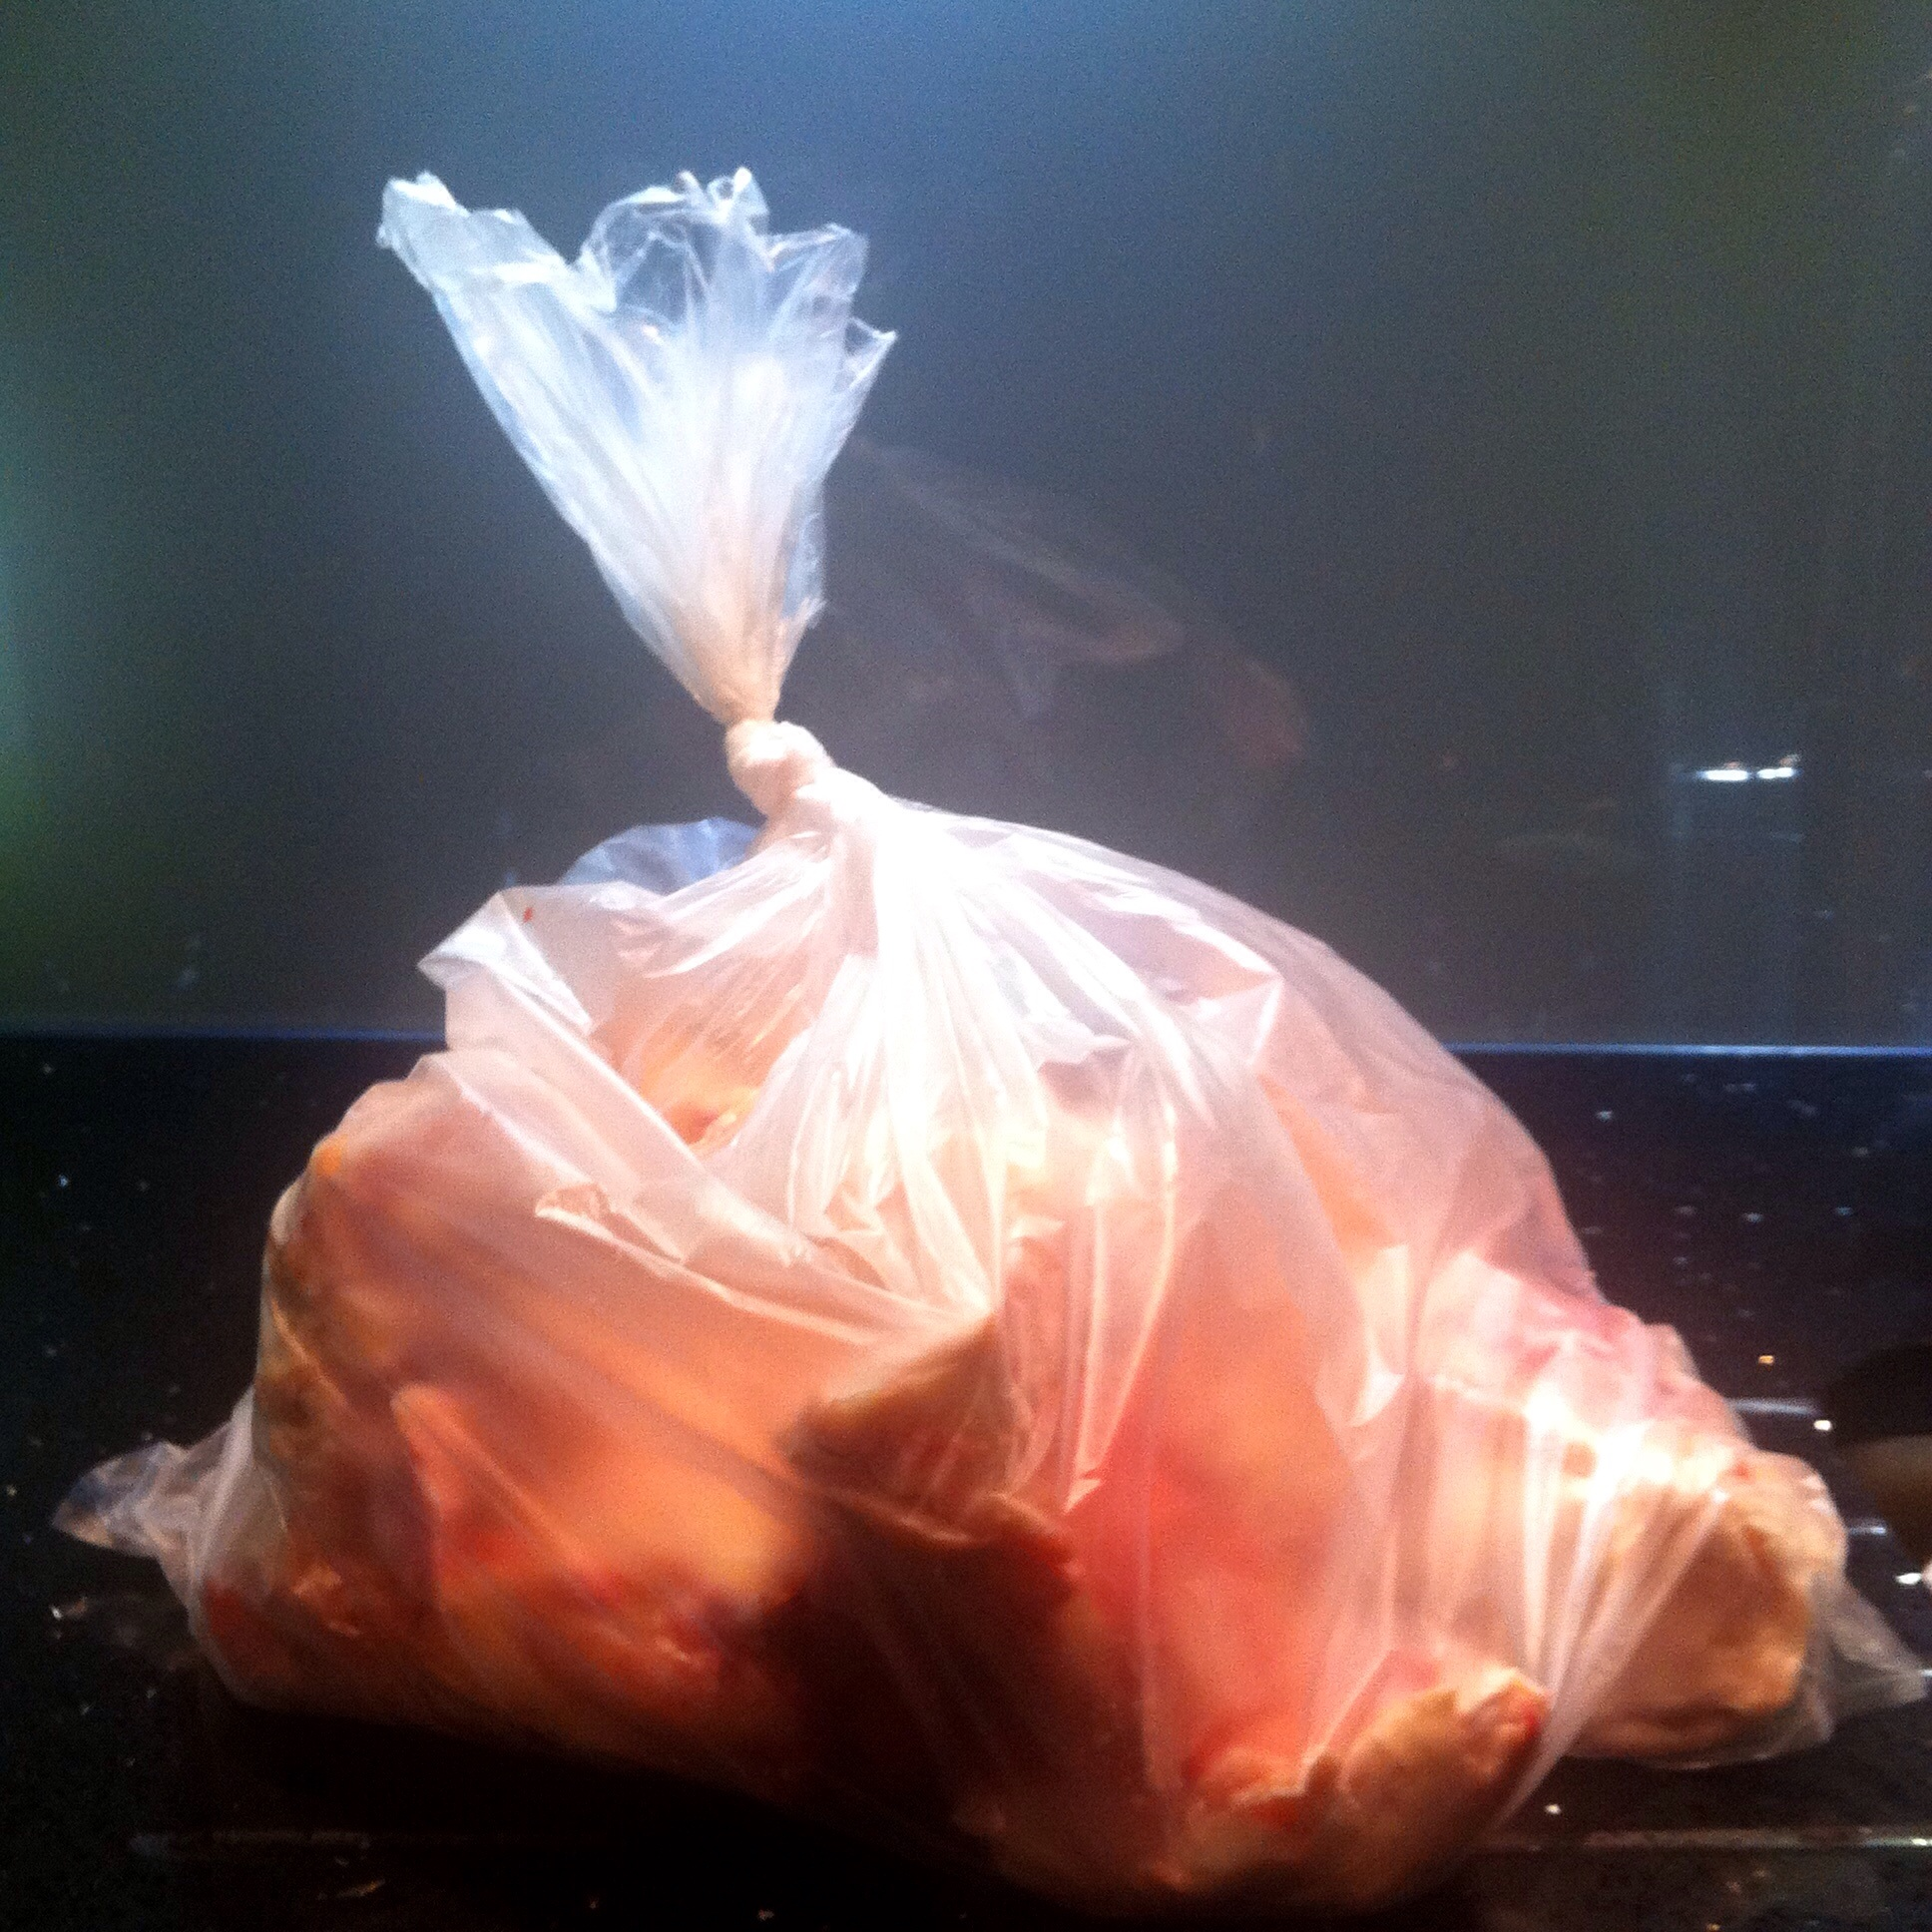 A large bag of bones